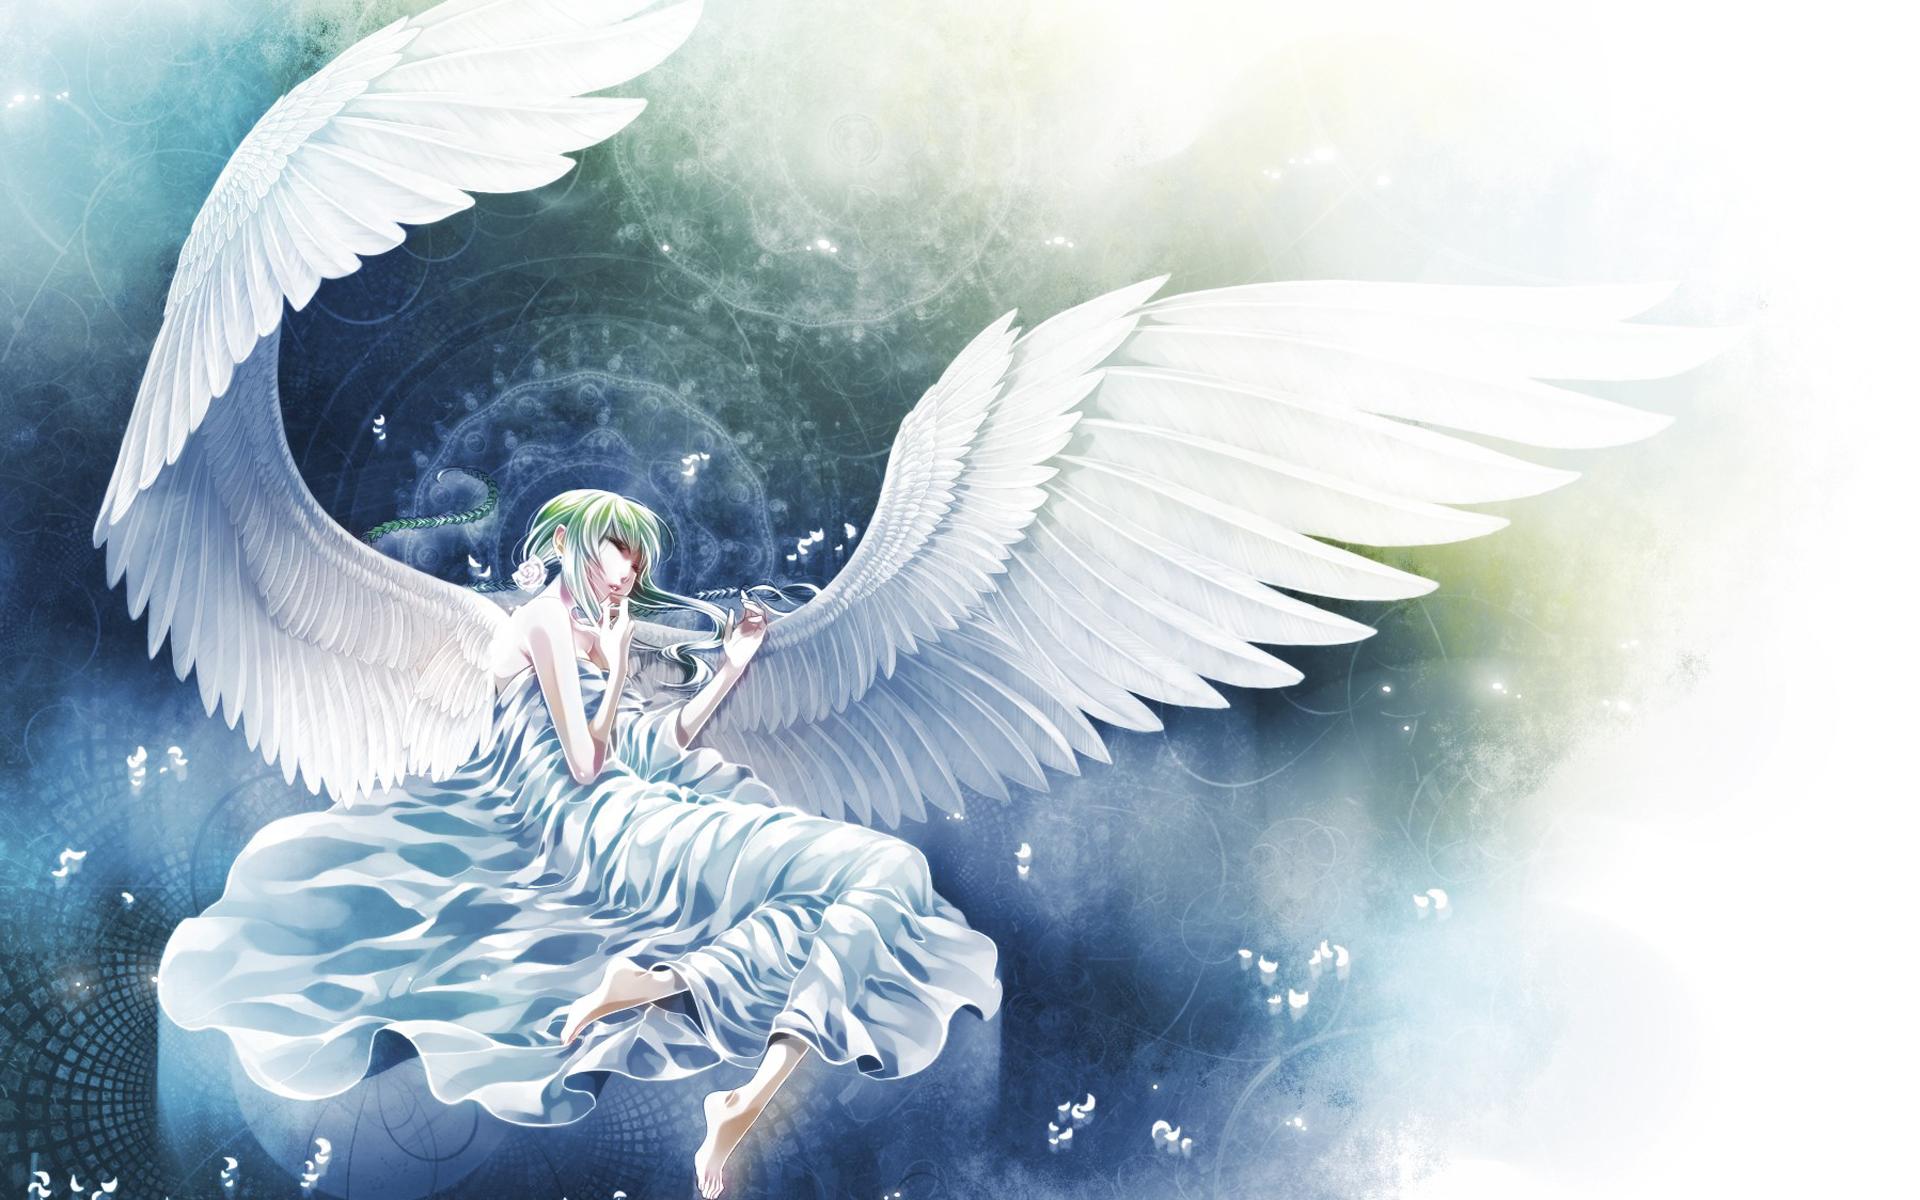 Anime angel girl sword original girls wings mood wallpaper - Angel girl wallpaper ...